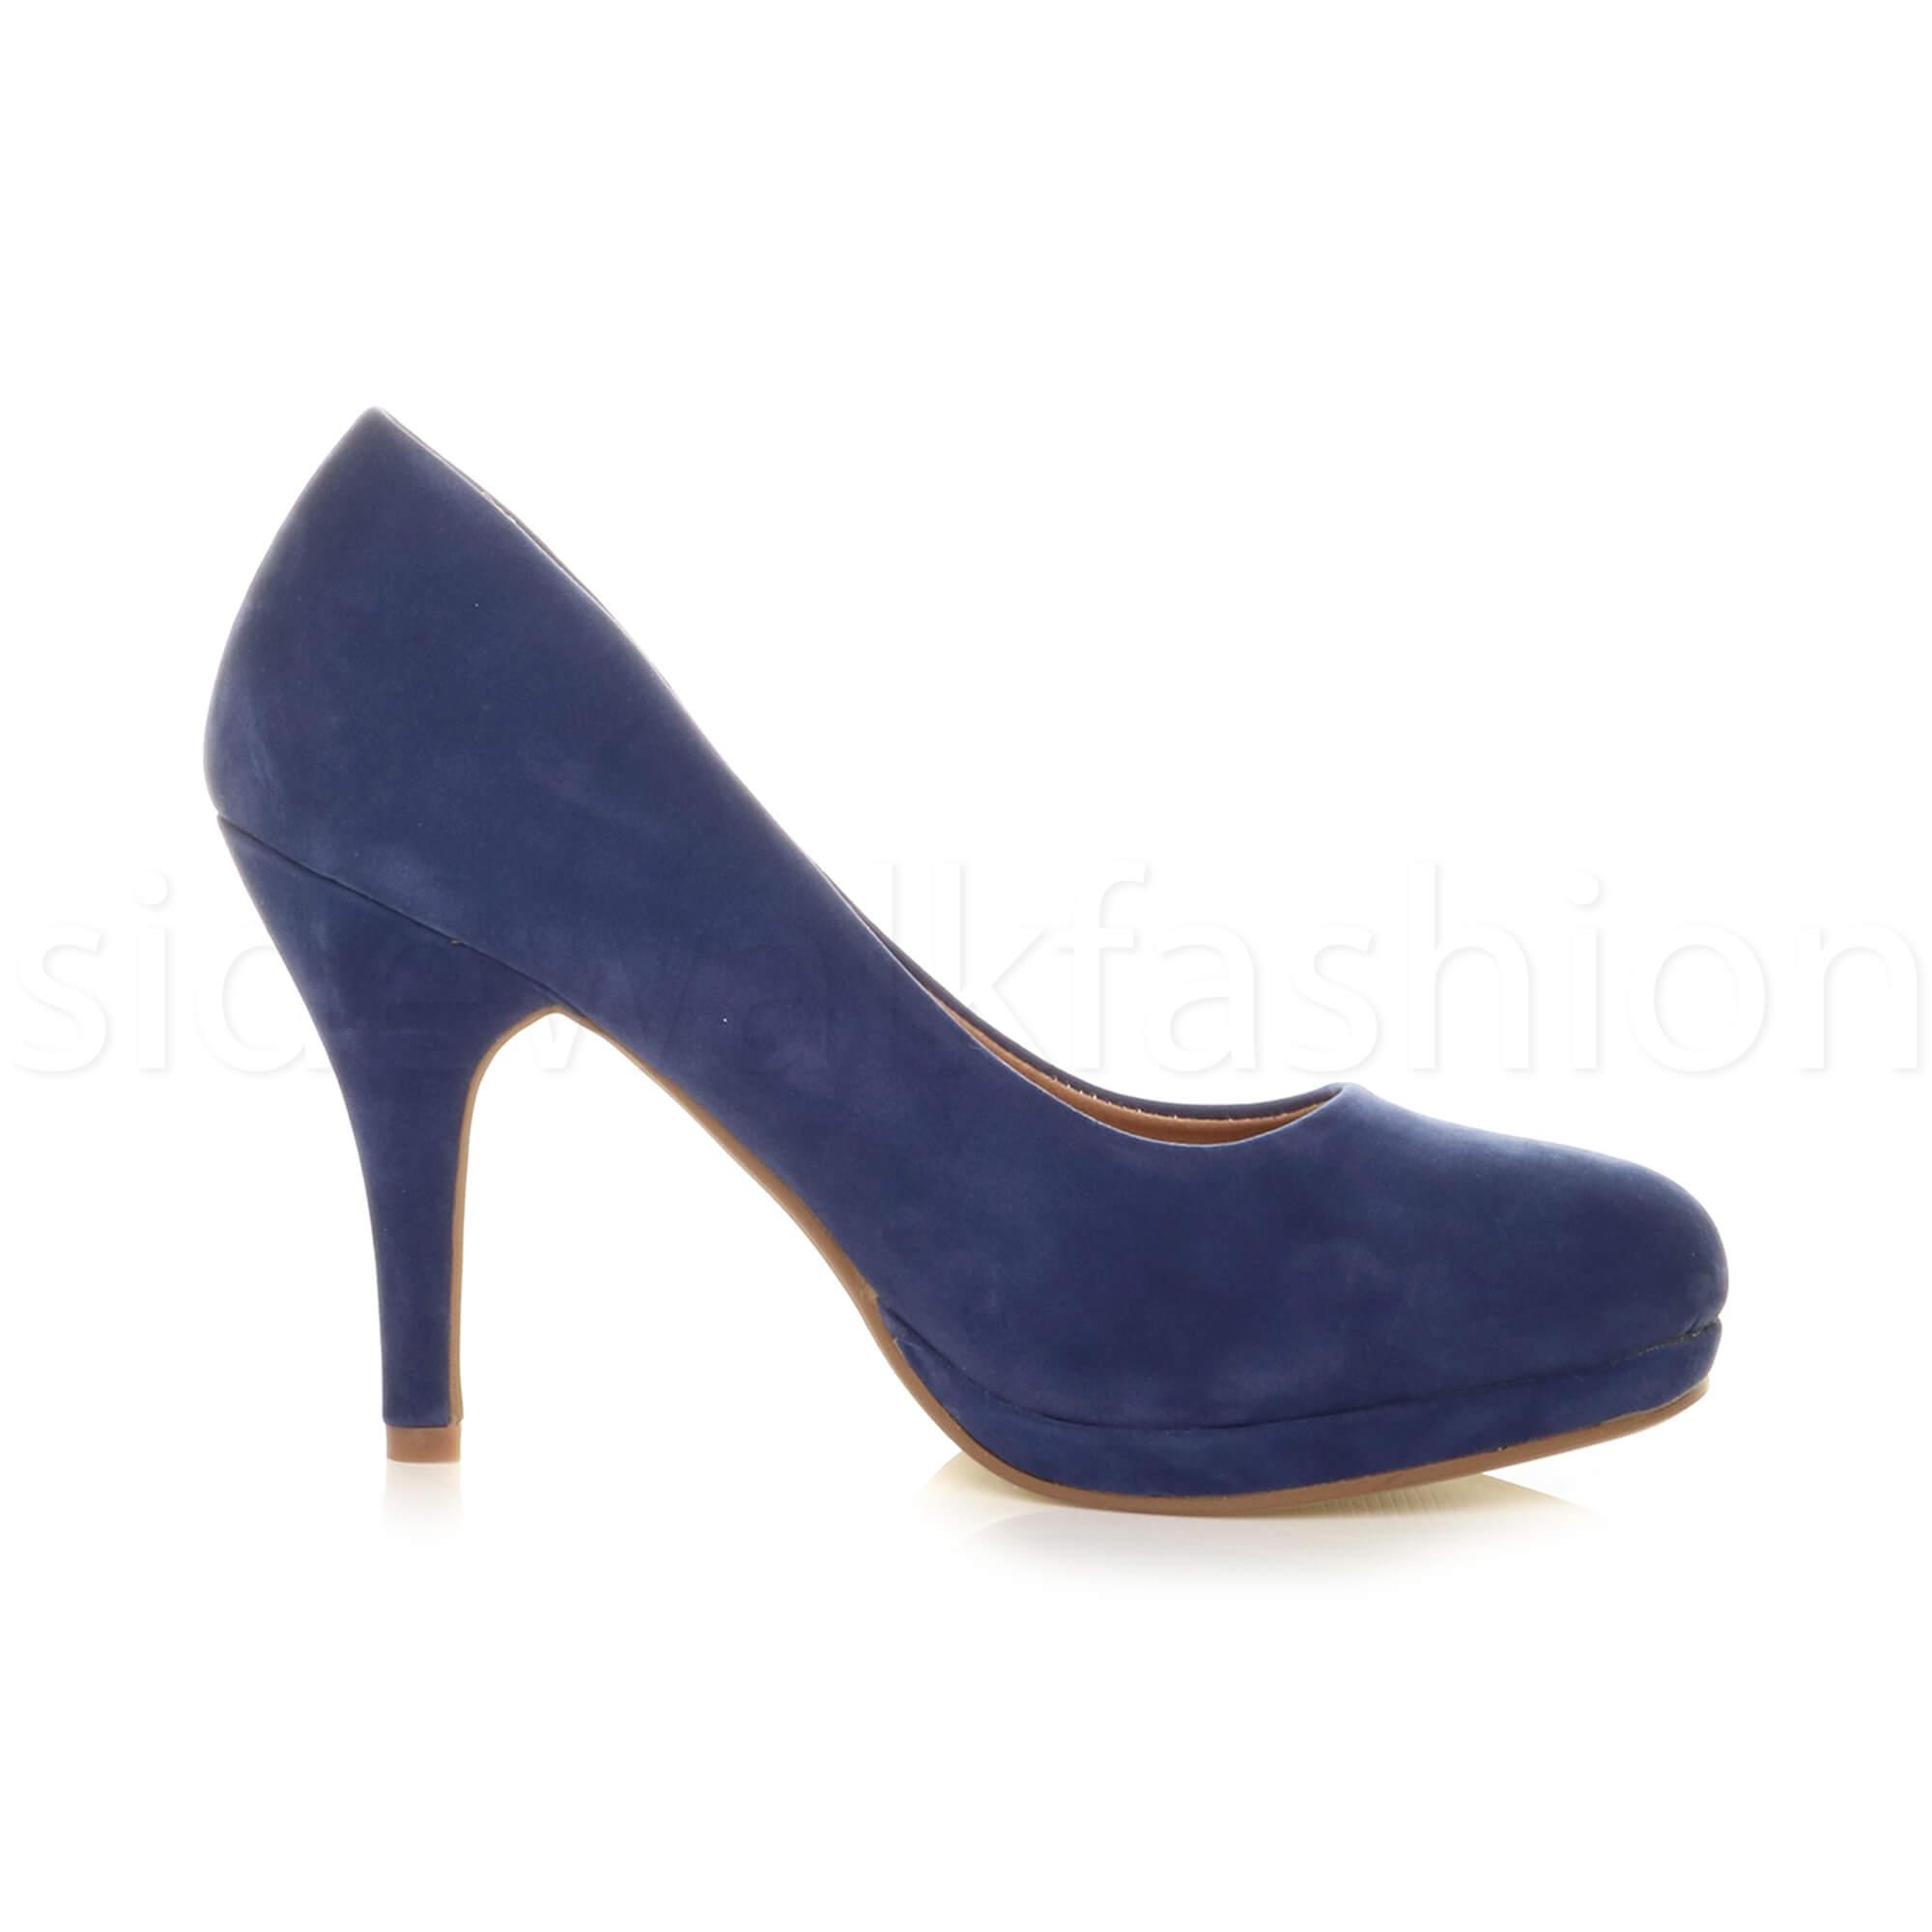 Womens-ladies-high-mid-heel-platform-wedding-evening-bridesmaid-court-shoes-size thumbnail 46